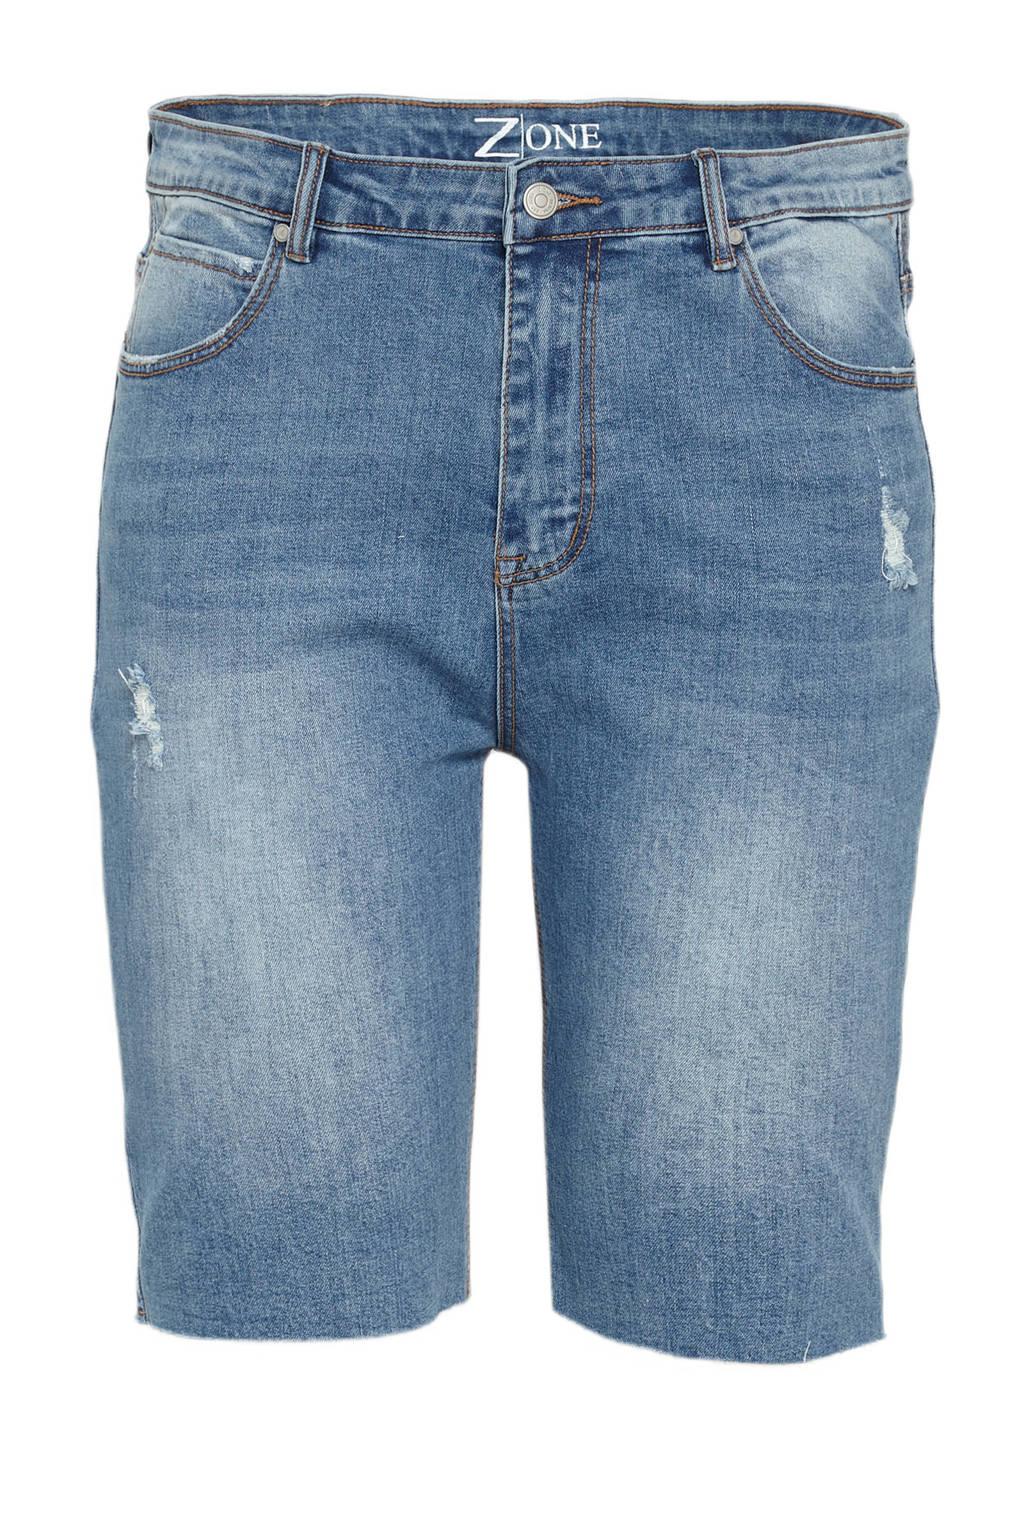 z-one bermuda jeans Josie  light denim, Light denim